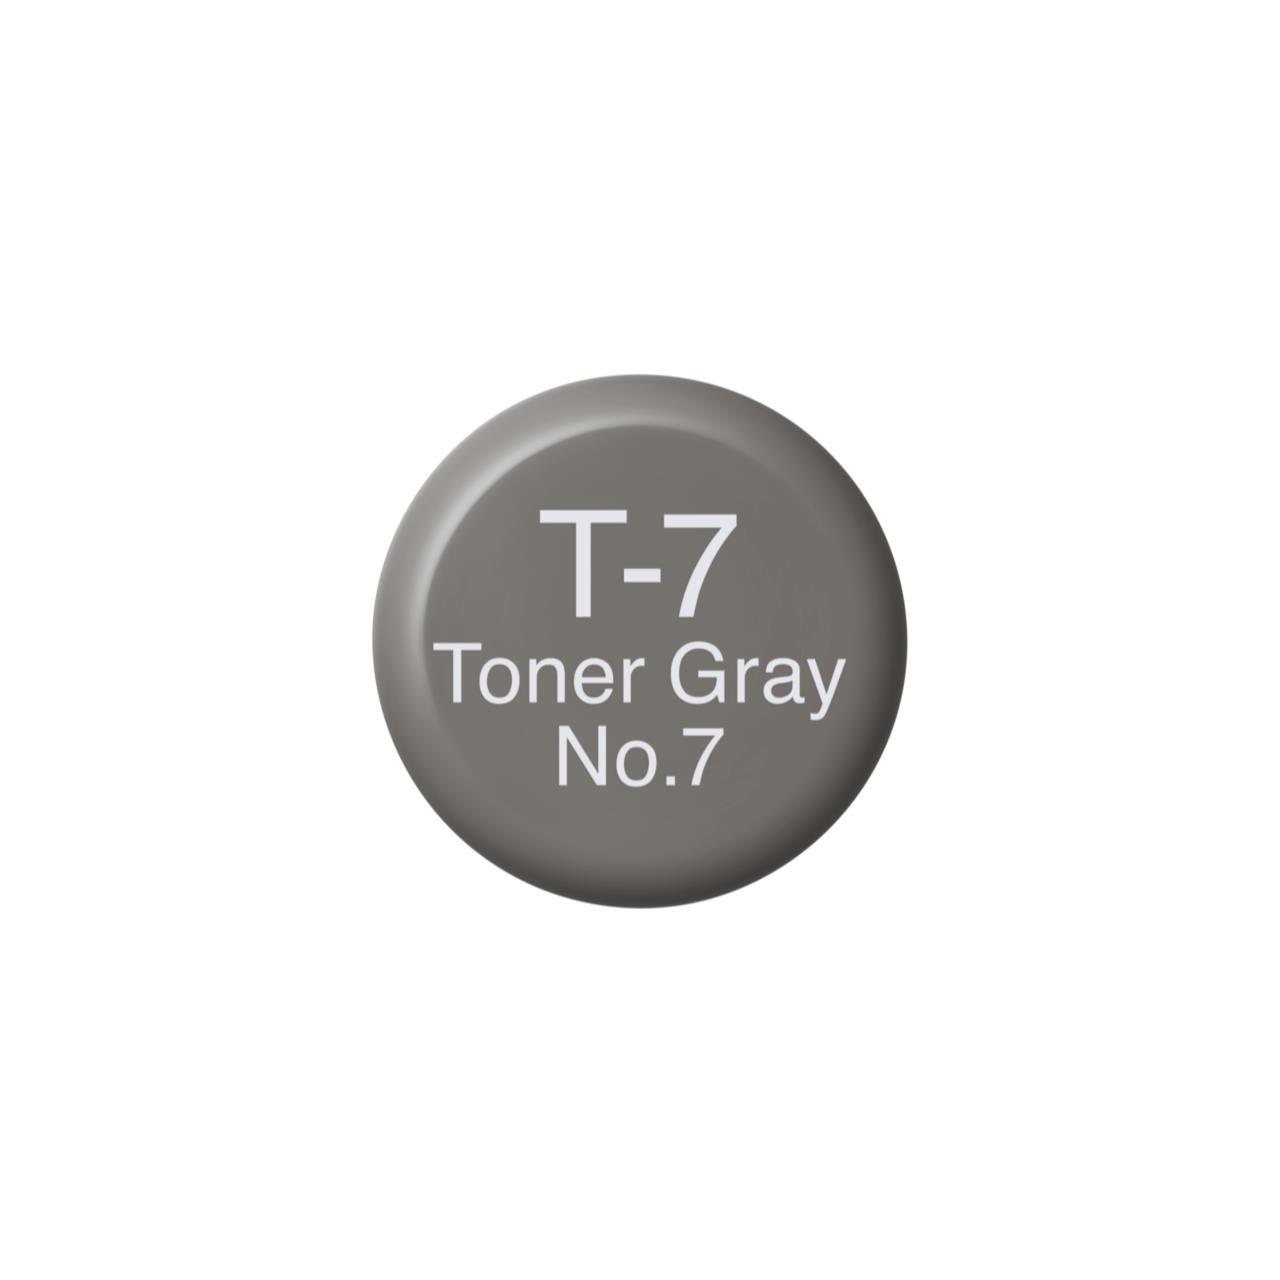 T7 Toner Gray 7, Copic Ink - 4511338055618